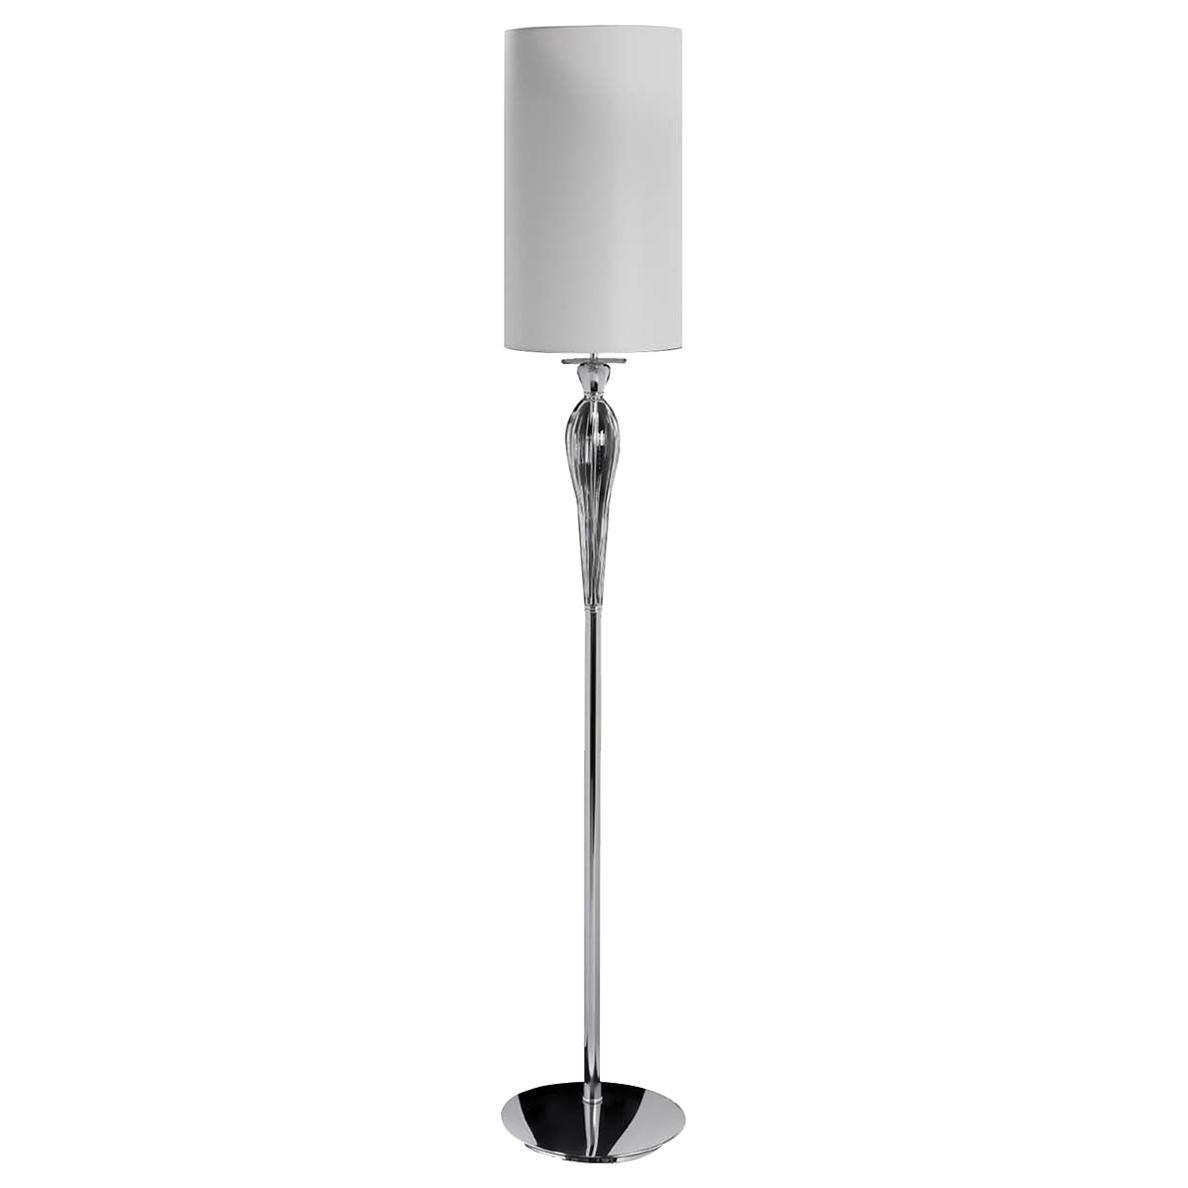 Soffio Floor Lamp